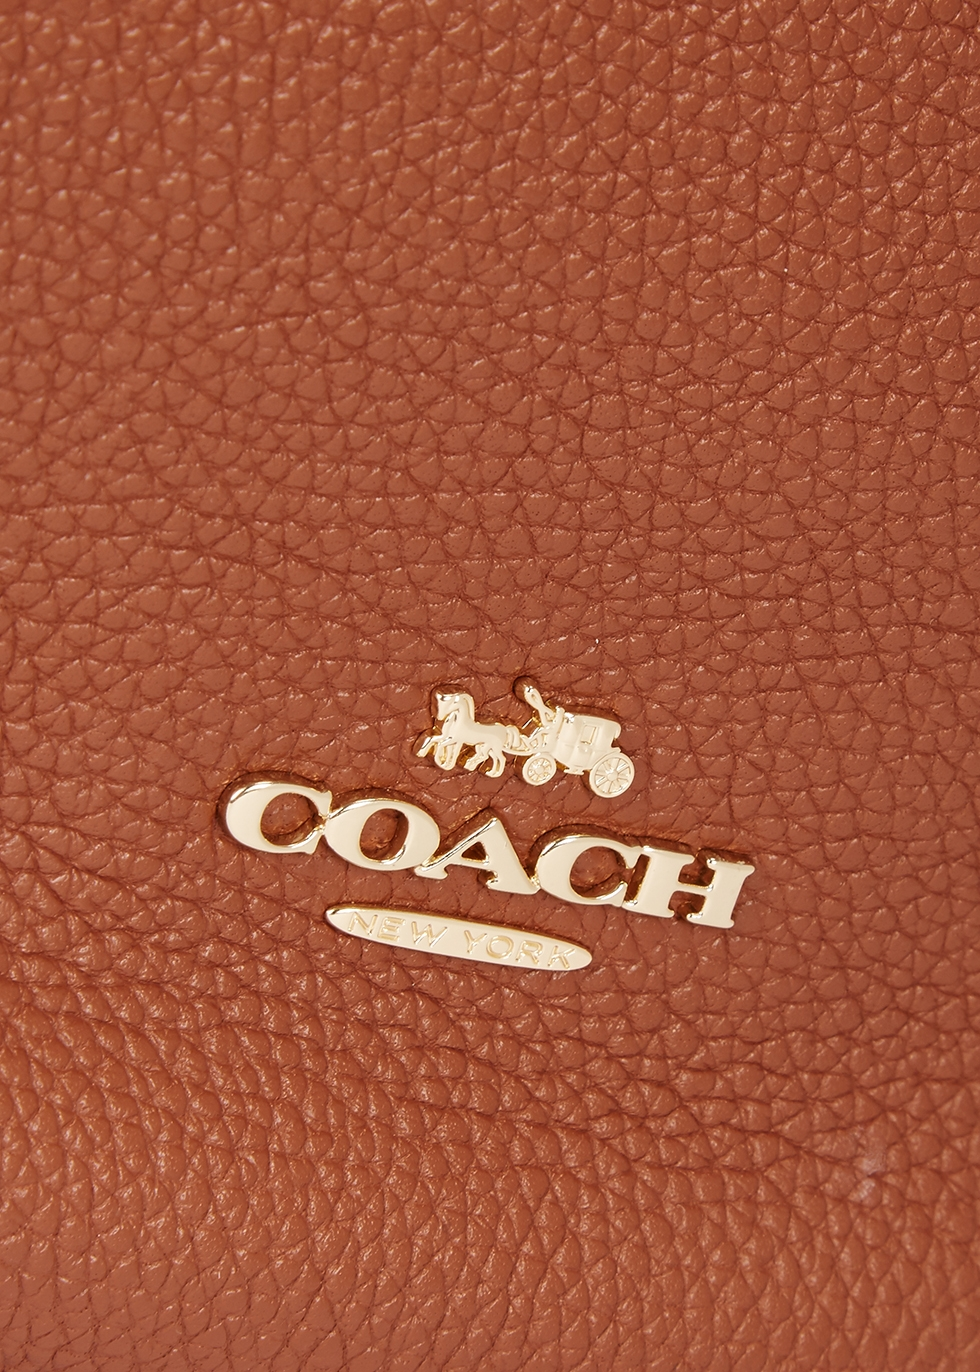 Lane brown leather satchel - Coach